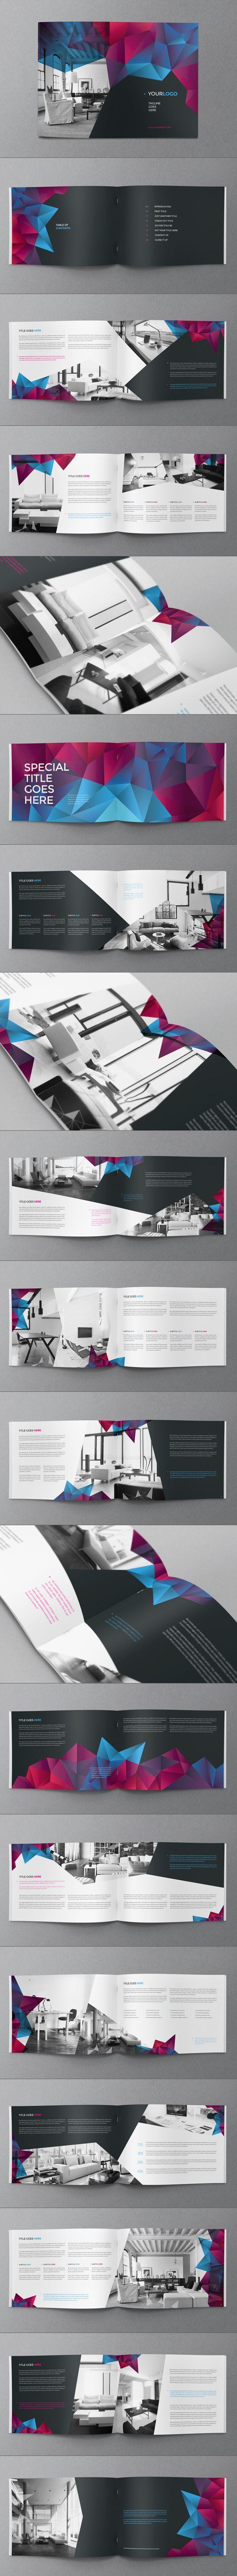 Cool Modern Brochure. Download here: http://graphicriver.net/item/cool-modern-brochure/7813777?ref=abradesign&utm_content=buffera0116&utm_medium=social&utm_source=pinterest.com&utm_campaign=buffer #brochure #design